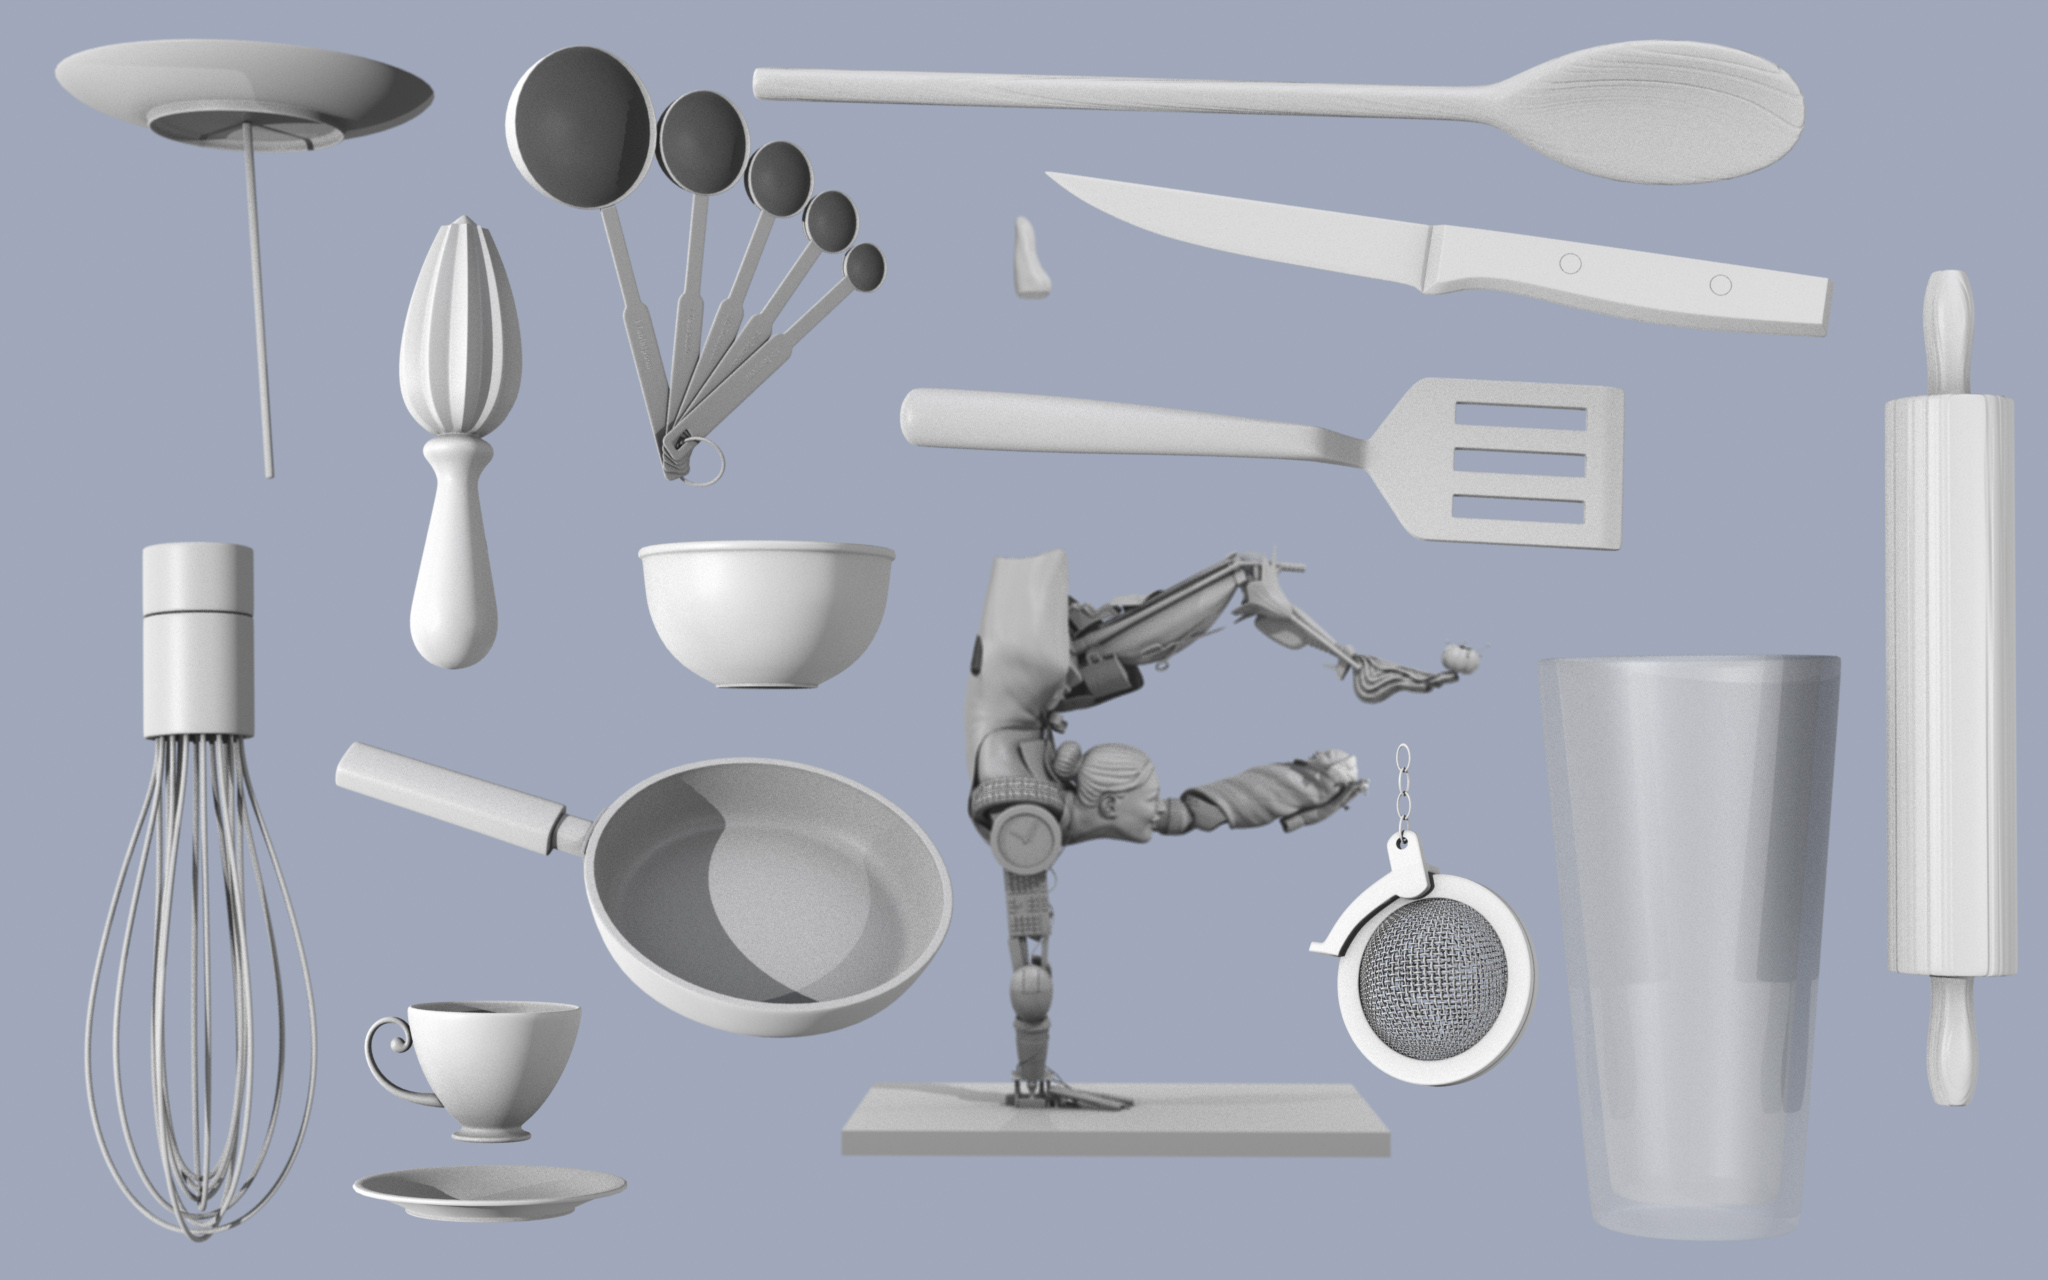 Juggler Right Leg - Kitchen Props - final render